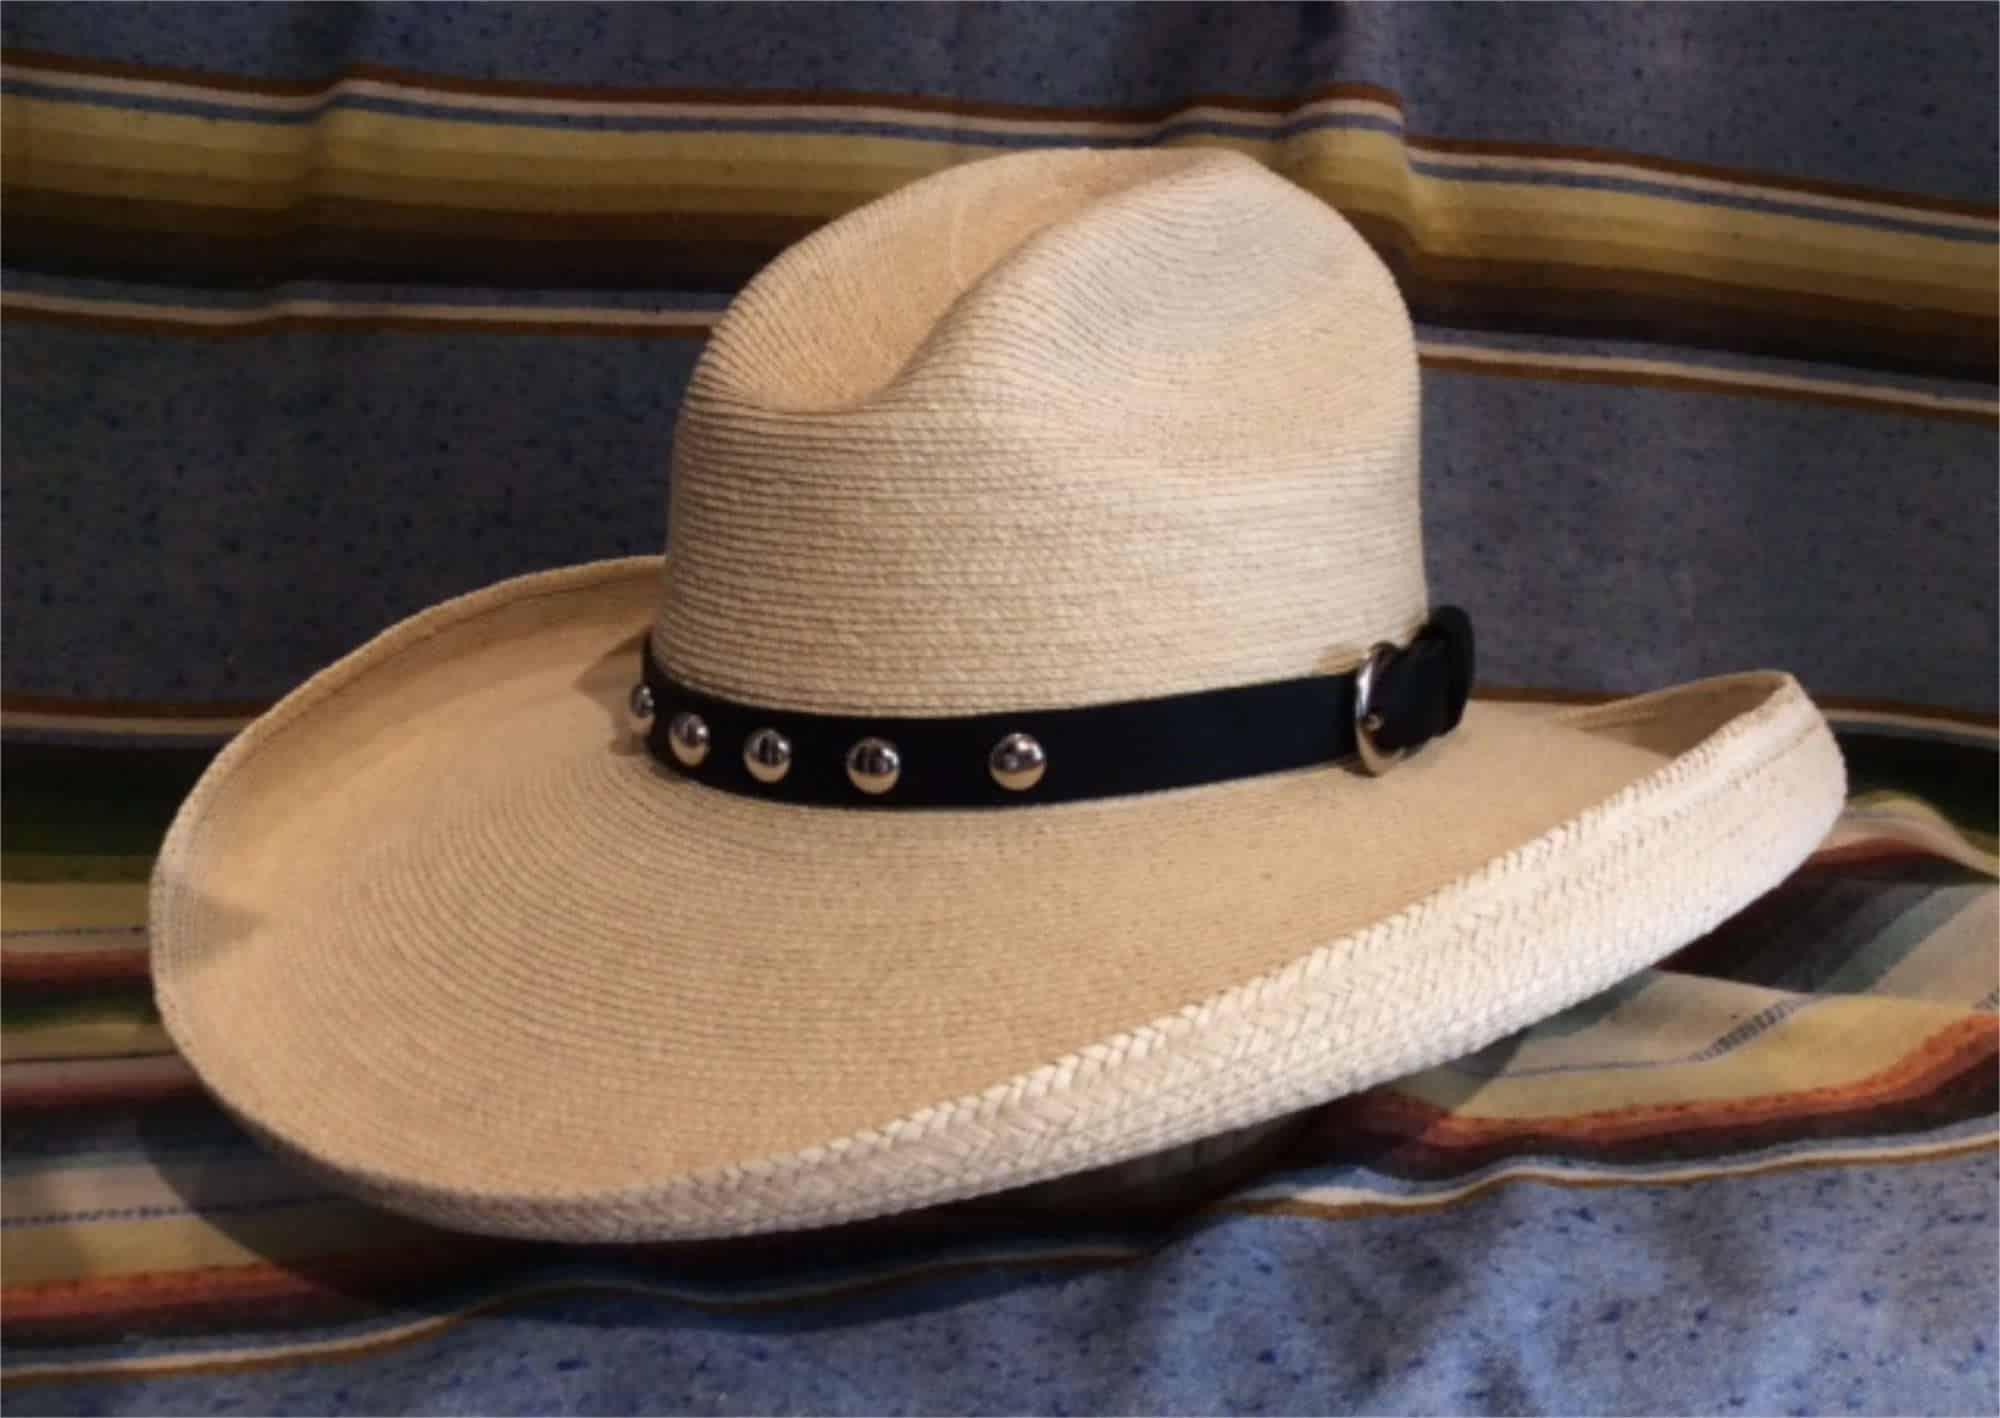 raincatcher style hat with black leather band